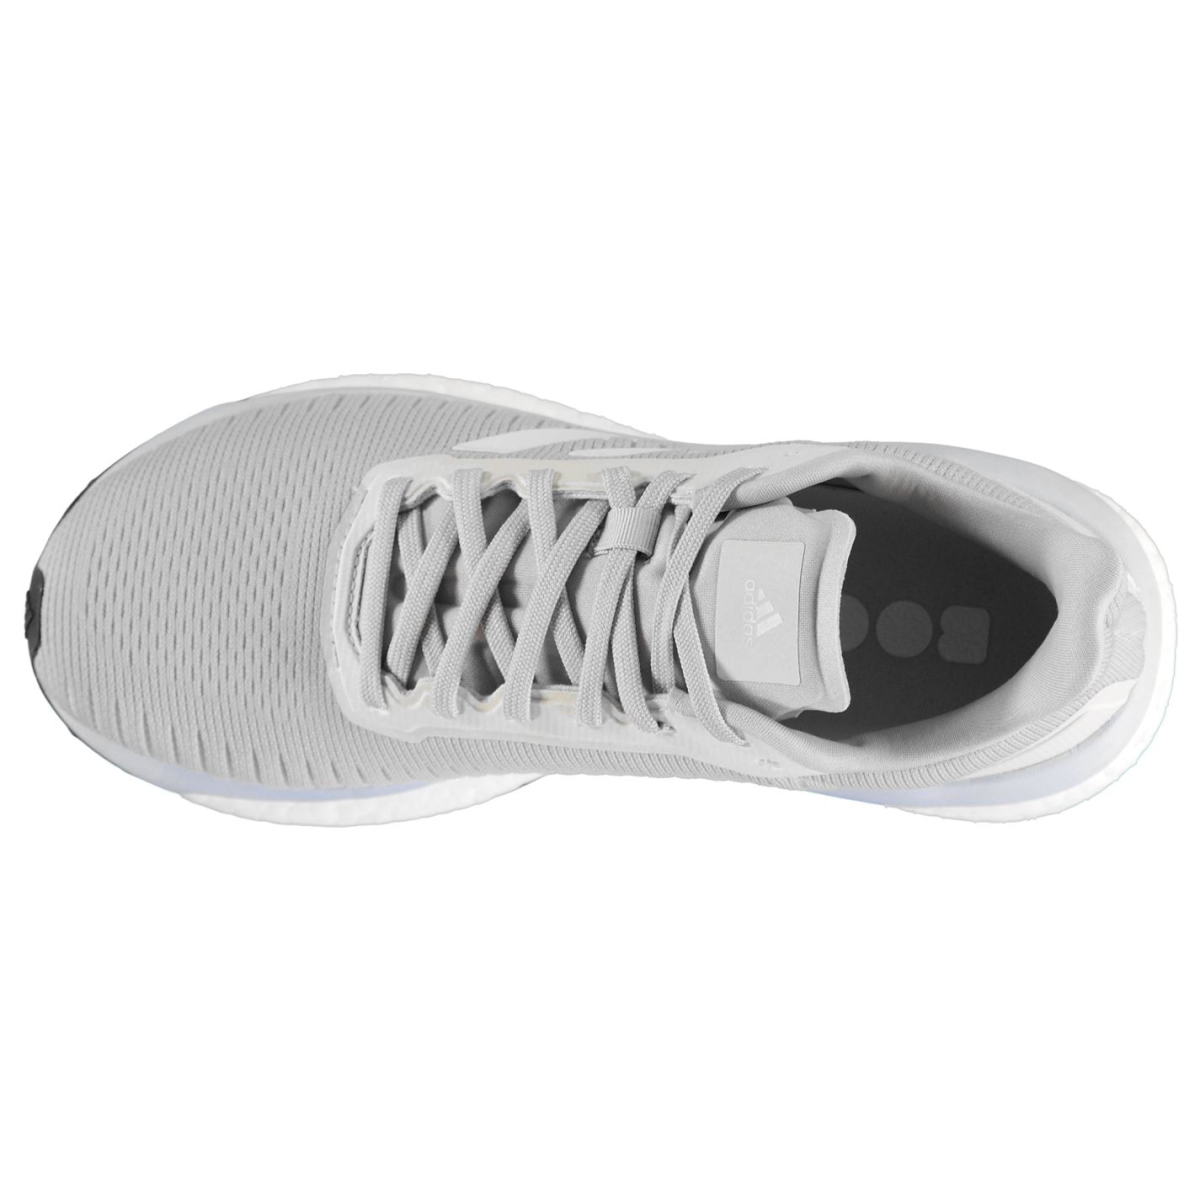 adidas-Solar-Drive-Laufschuhe-Damen-Sportschuhe-Turnschuhe-Jogging-4095 Indexbild 4